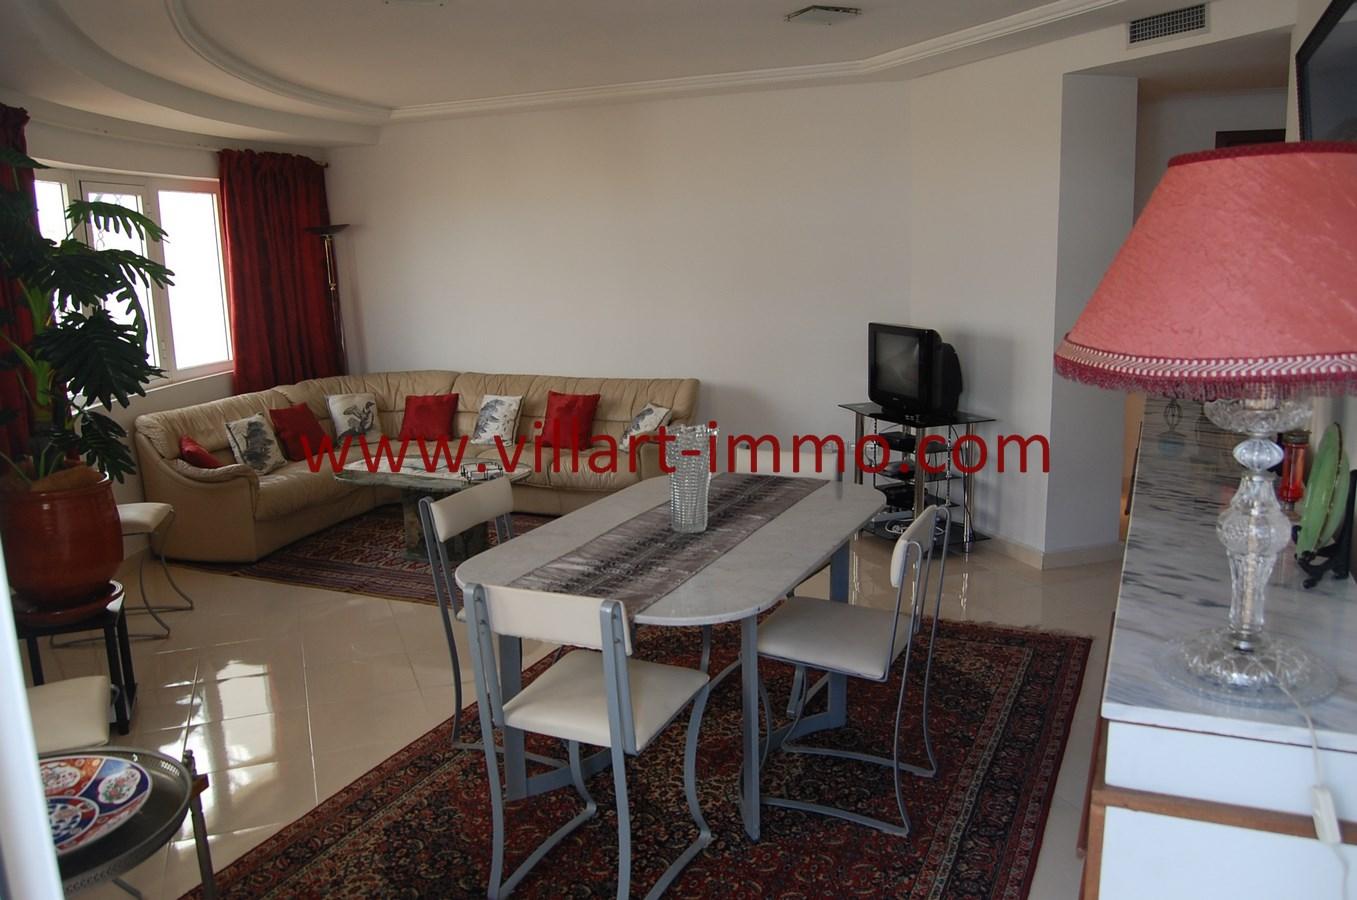 3-Vente-Appartement-Tanger-Route de Rabat-Salon 2-VA494-Villart Immo